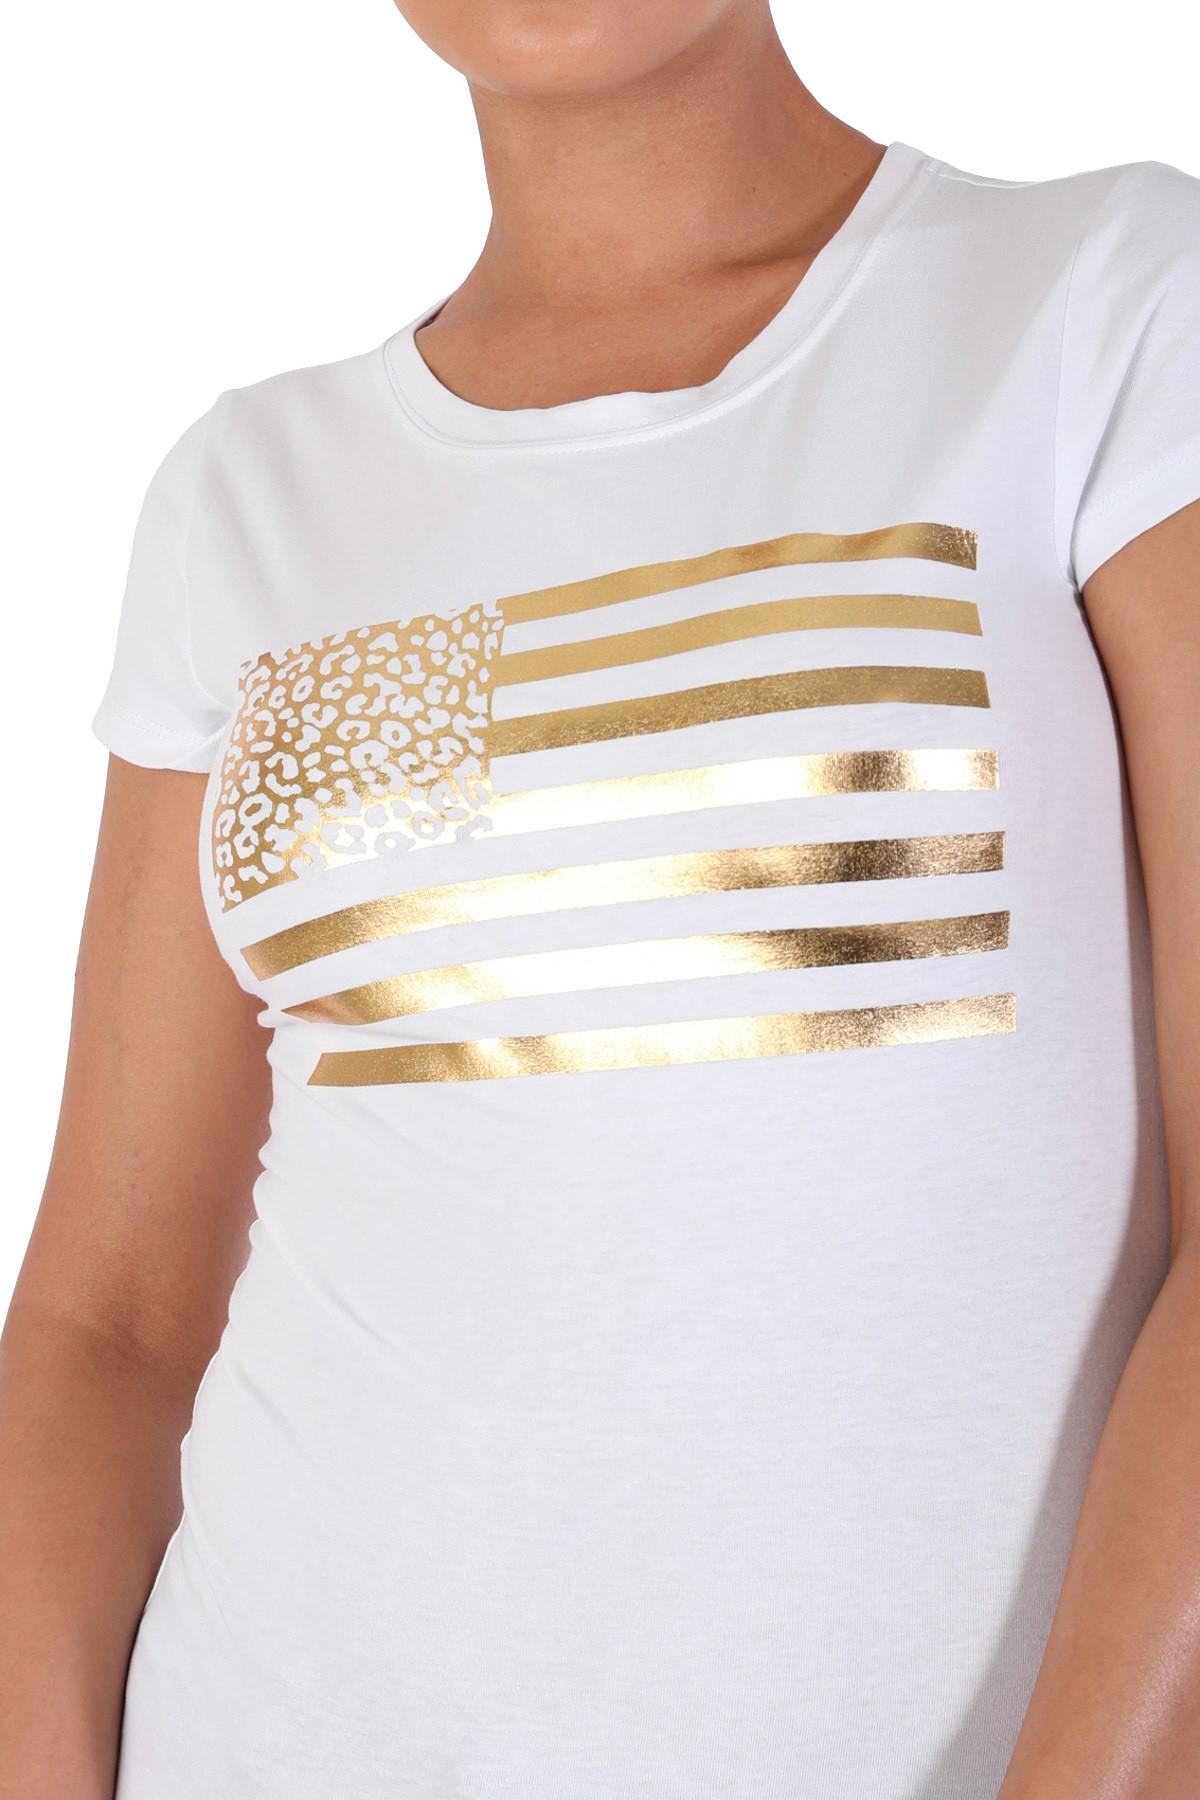 Women-039-s-Juniors-Patriotic-Casual-Graphic-Print-Short-Sleeve-T-Shirt-Top thumbnail 10